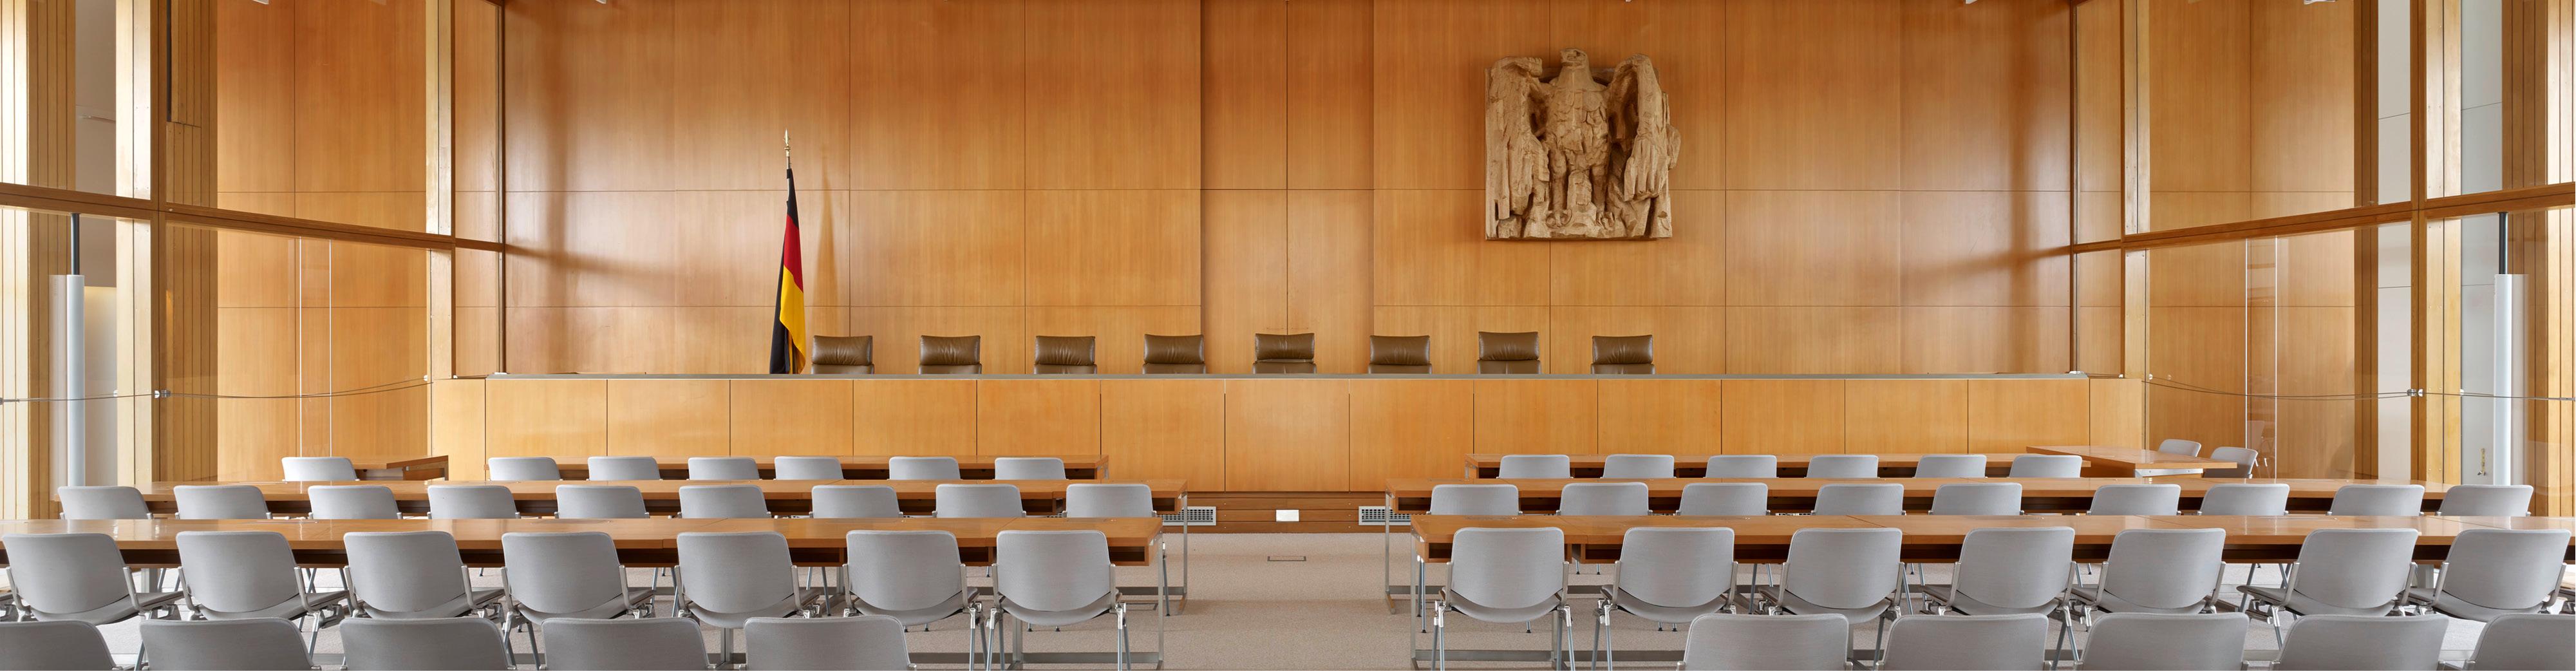 Große Rechtsunsicherheit Bei Befristeten Arbeitsverträgen Faz